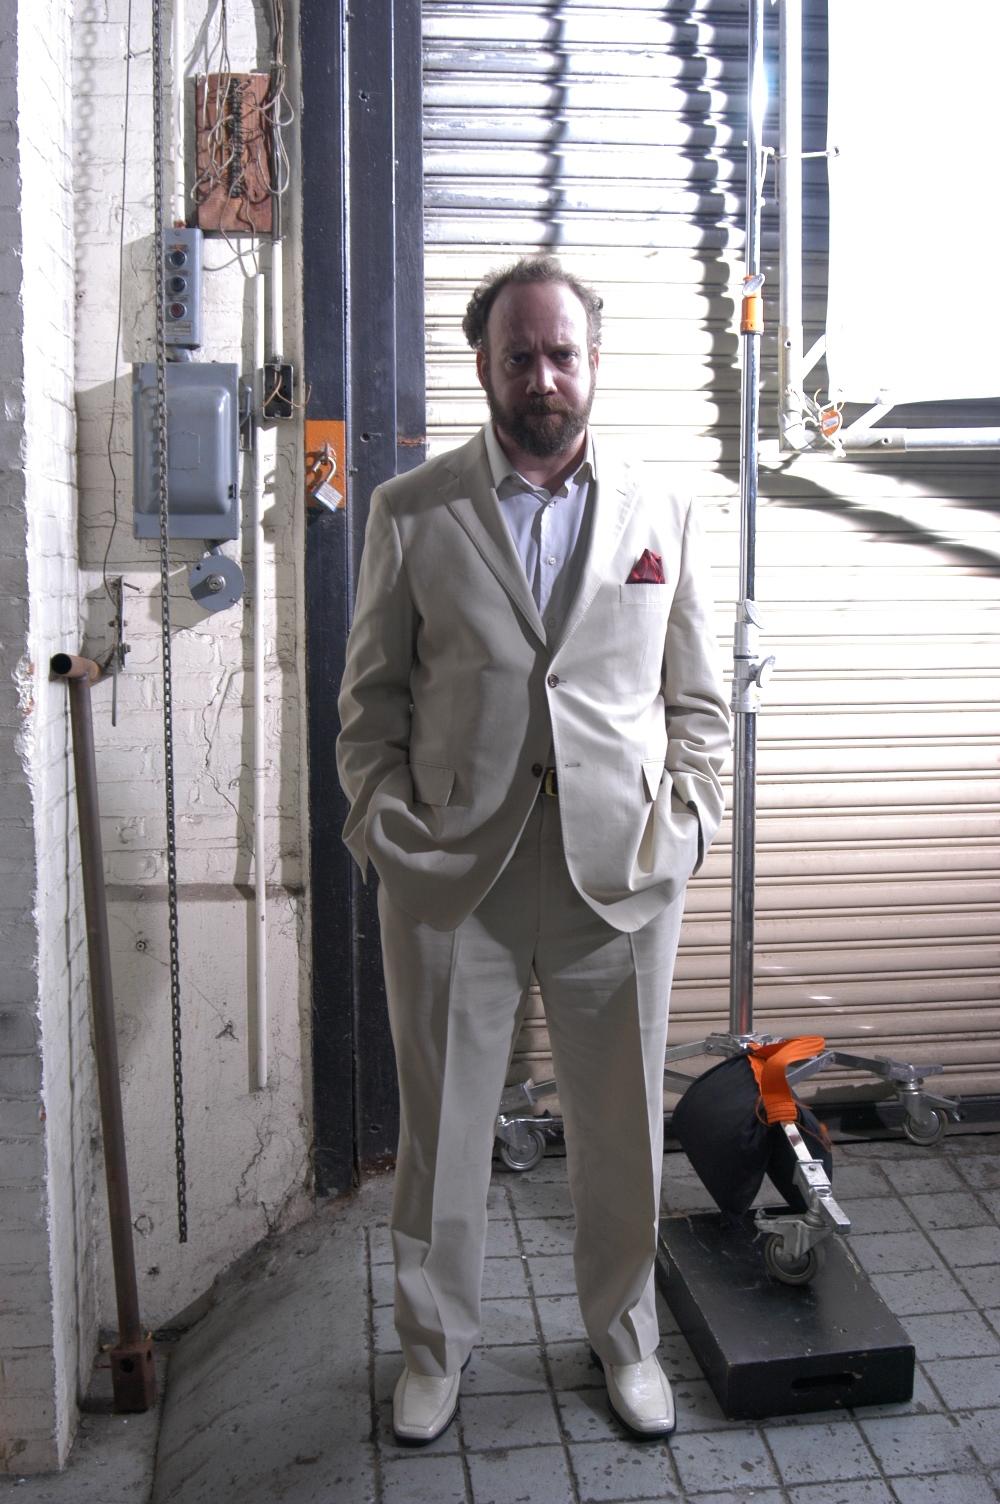 Paul Giamatti, Actor